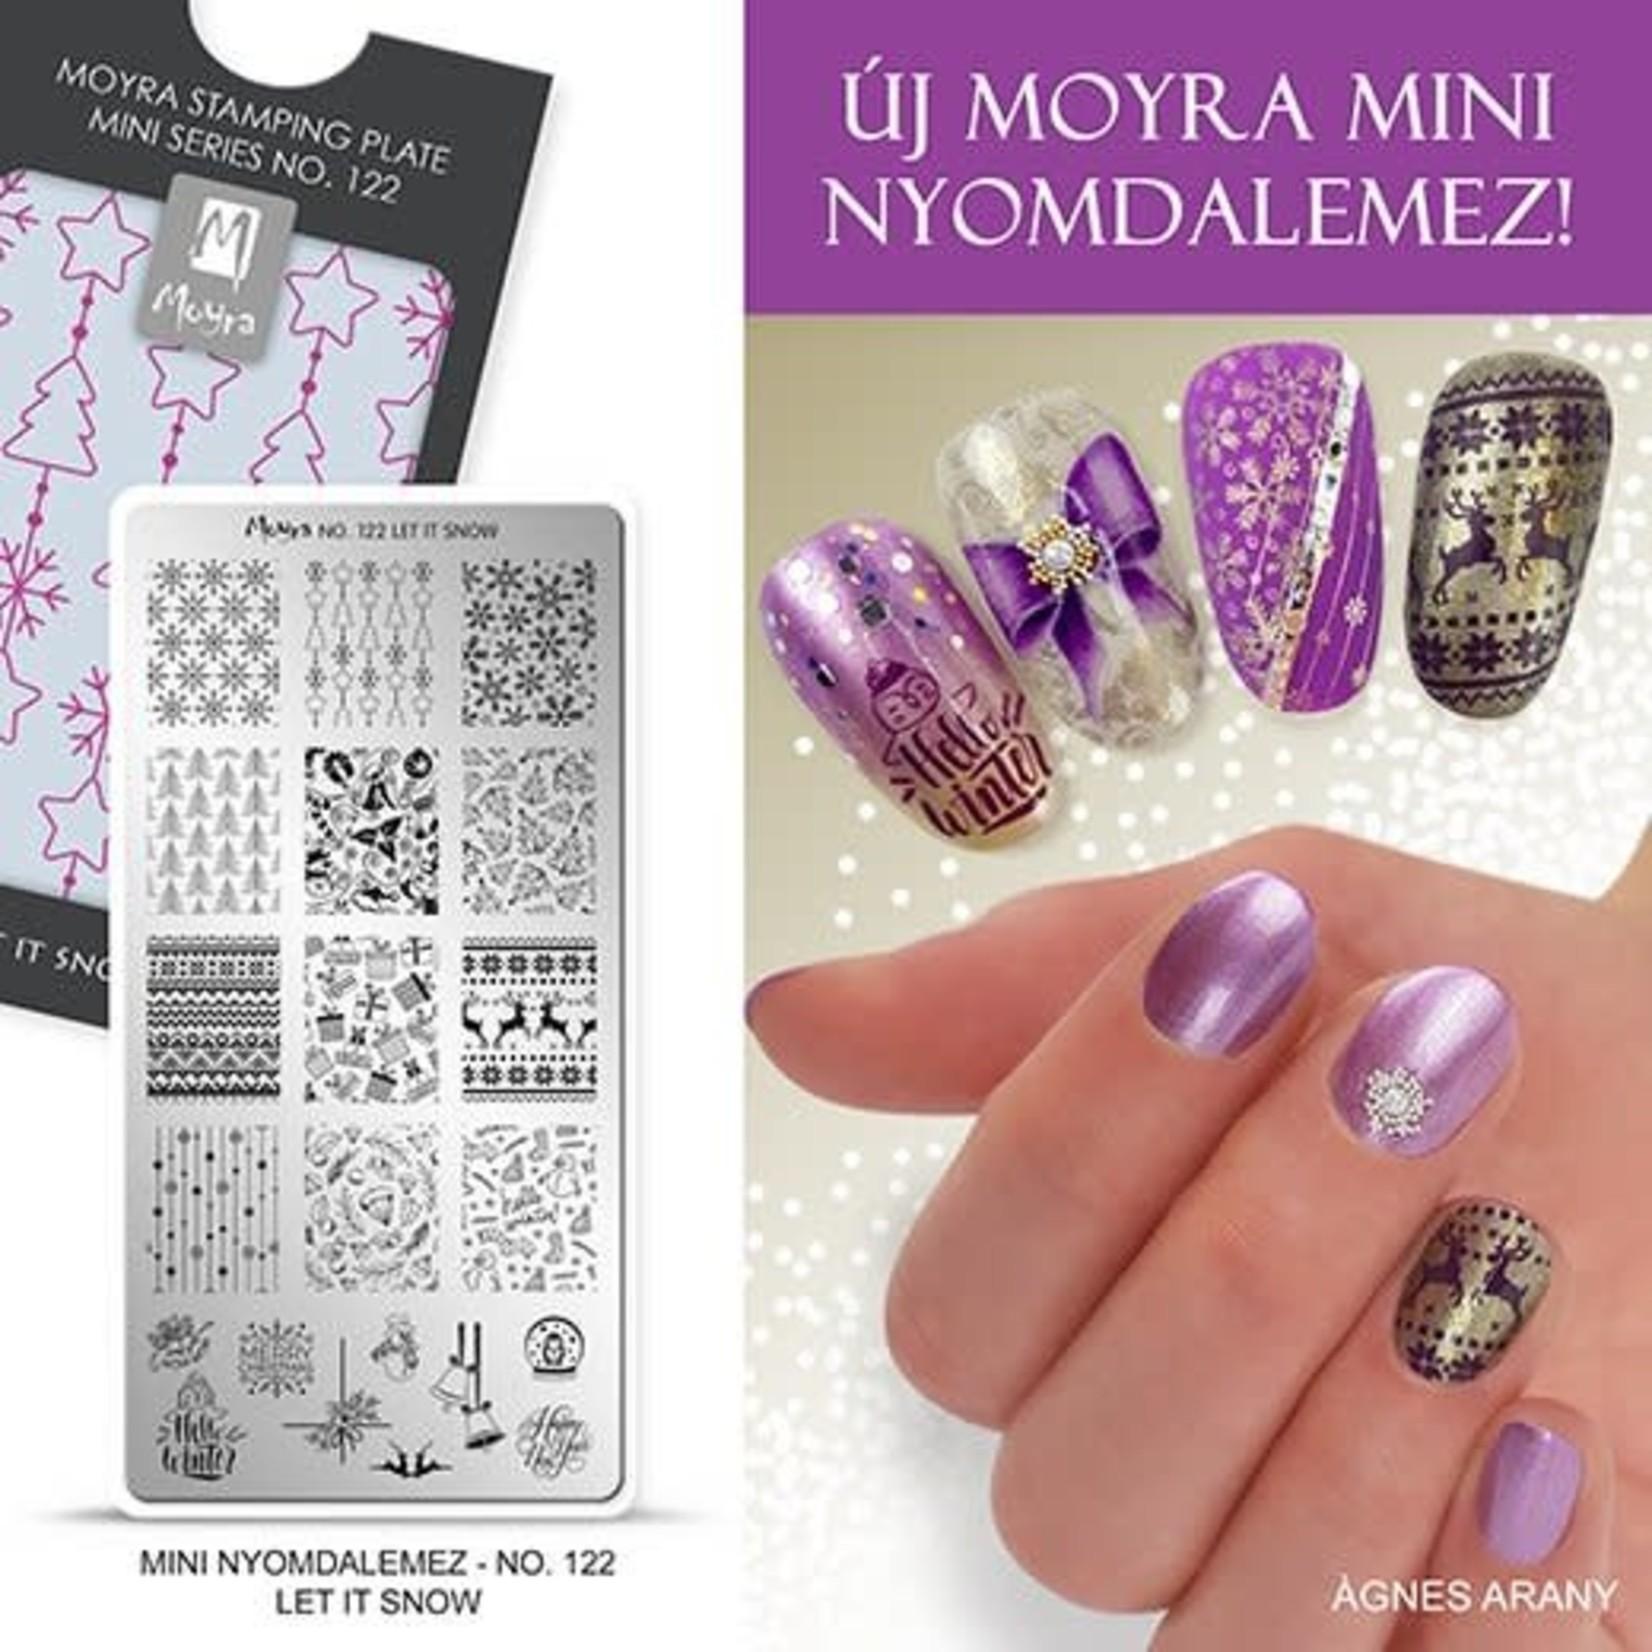 Moyra Moyra Mini Stamping plate 122 Let it snow